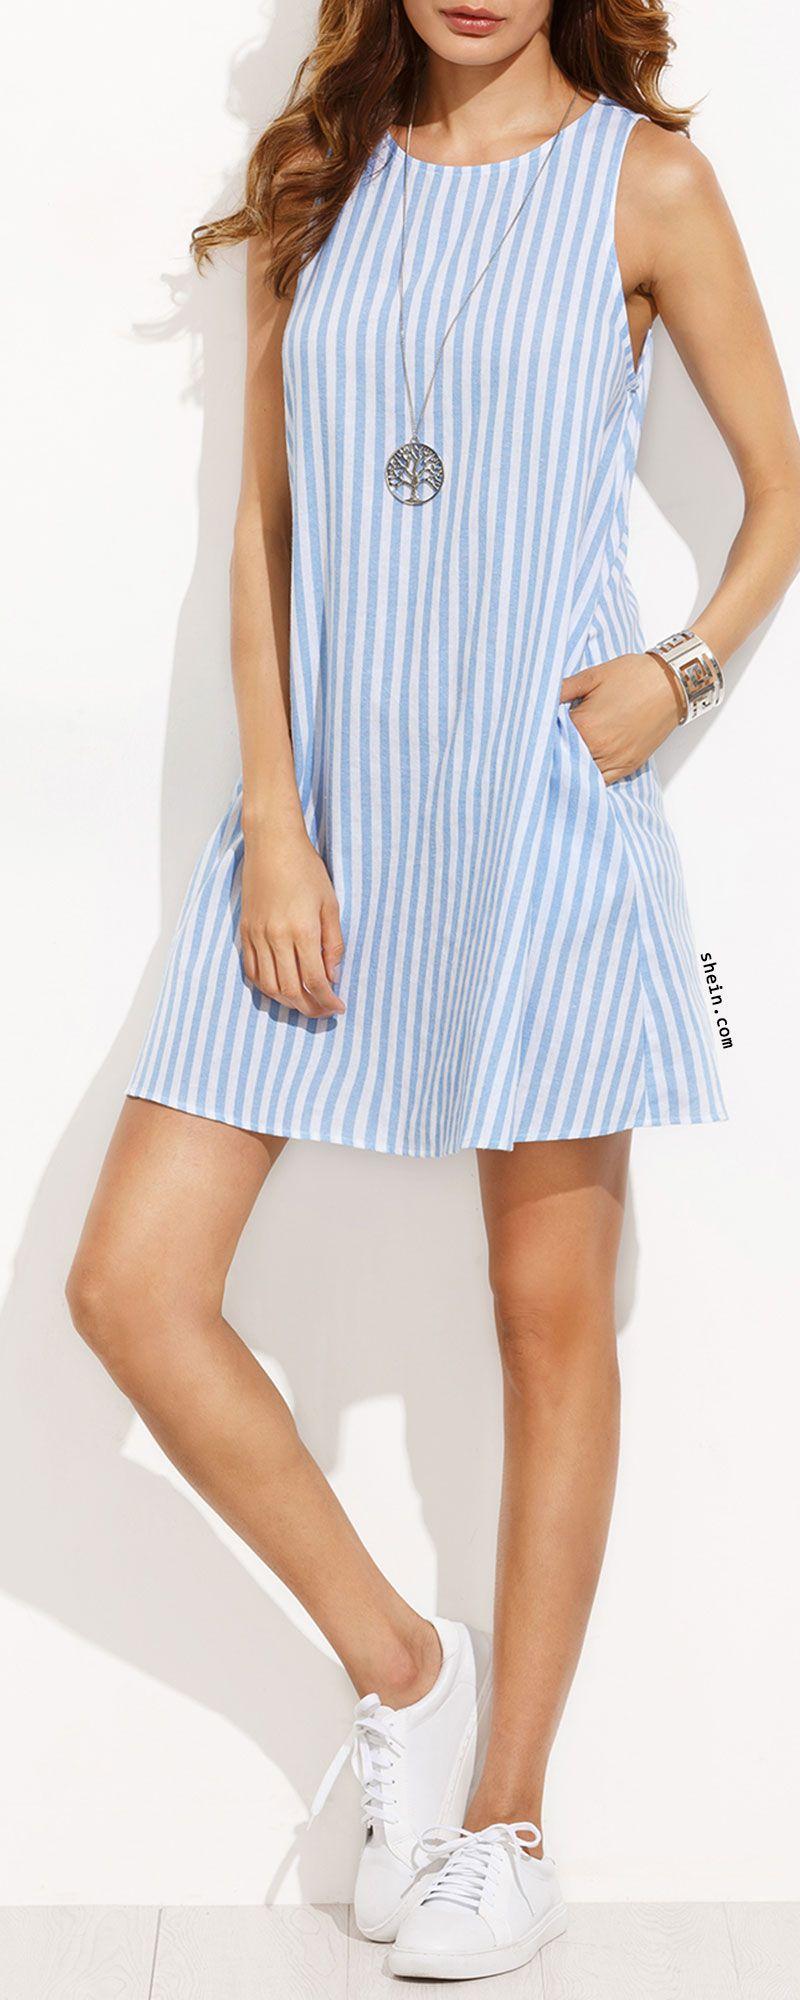 Blue and White Stripe Sleeveless Shift Dress